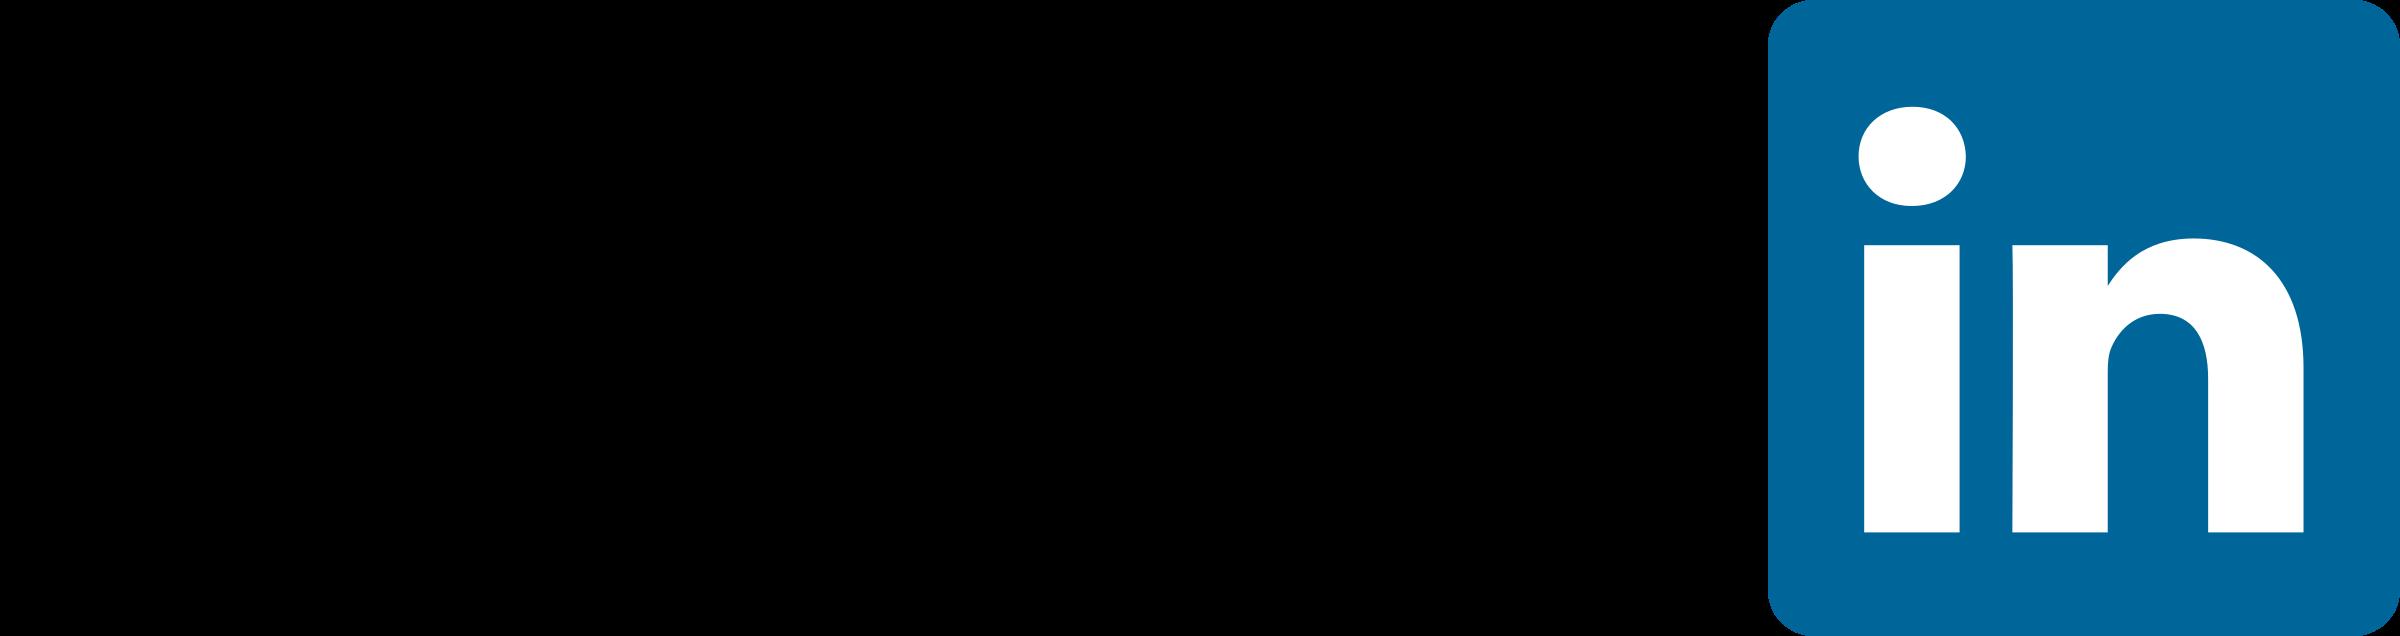 Linkedin Logo Vector At Getdrawings Com Free For Personal